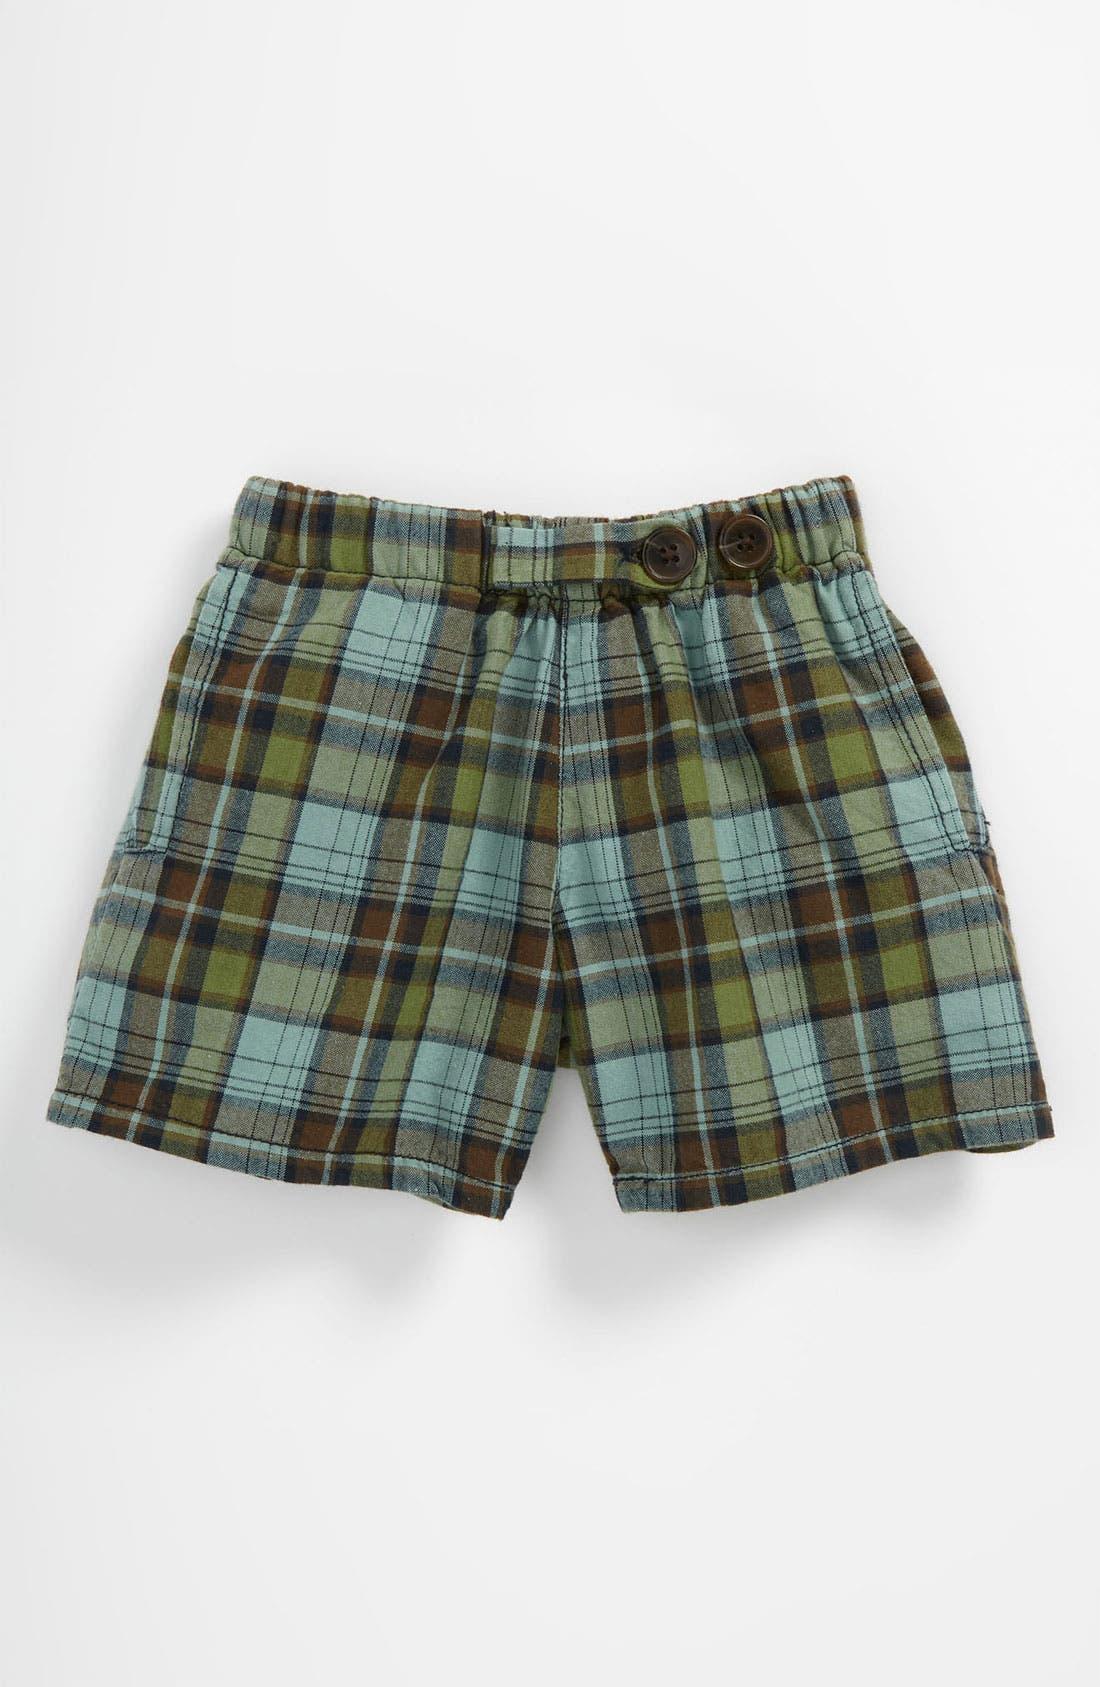 Main Image - Peek 'Bangalore - Havasu Plaid' Shorts (Baby)